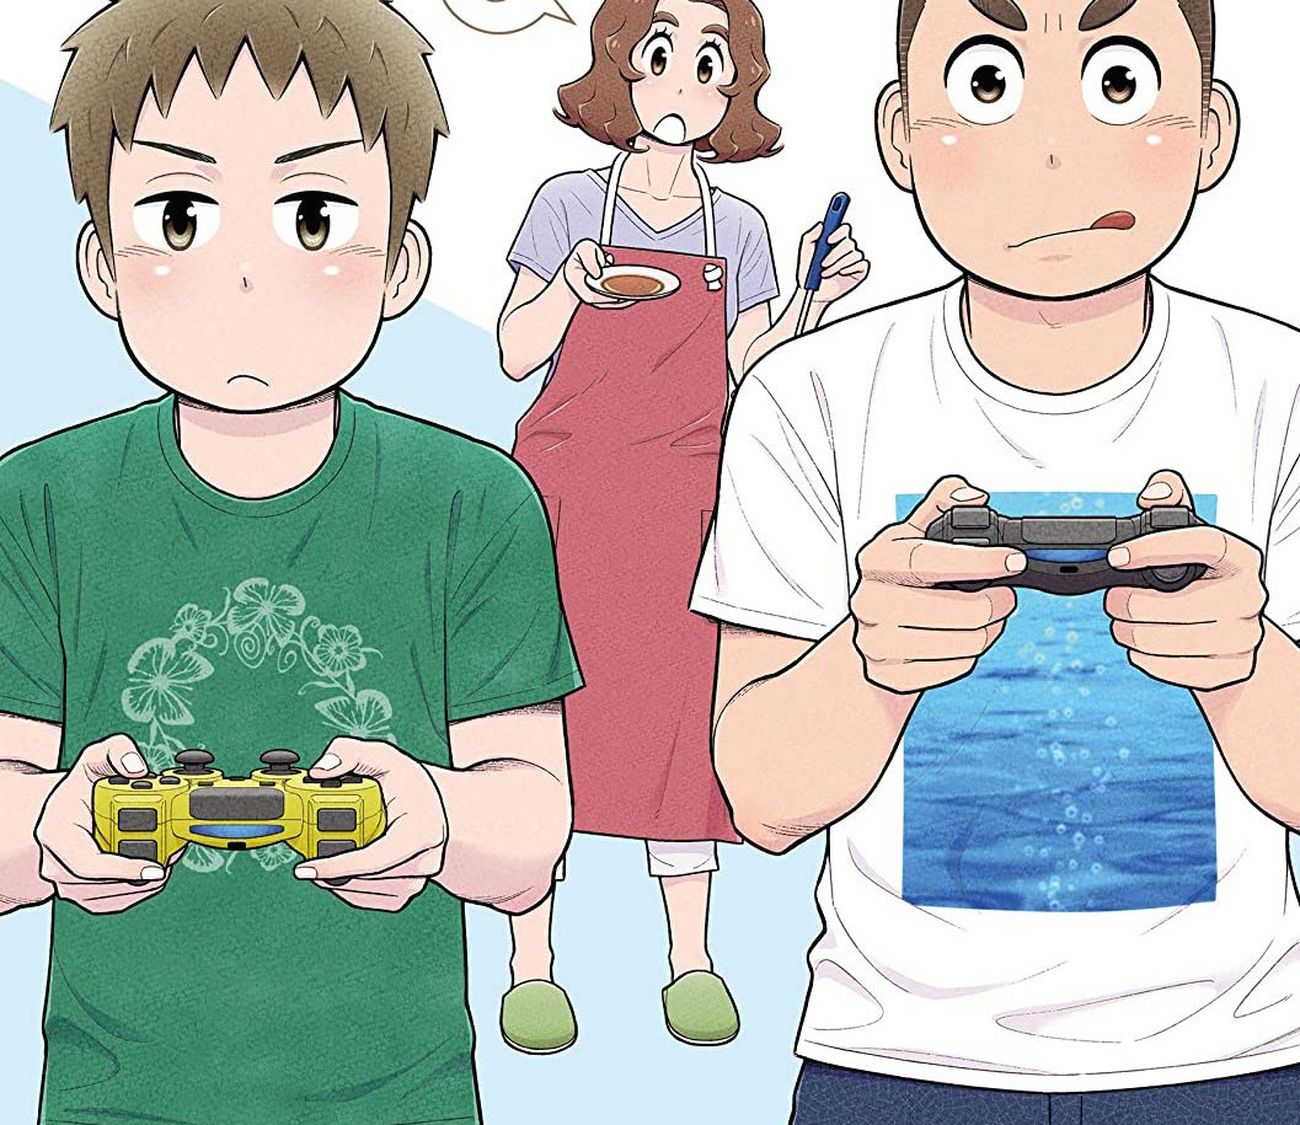 Okura – My son is probably gay. Vol. 1 (Star Comics, Perugia 2021)